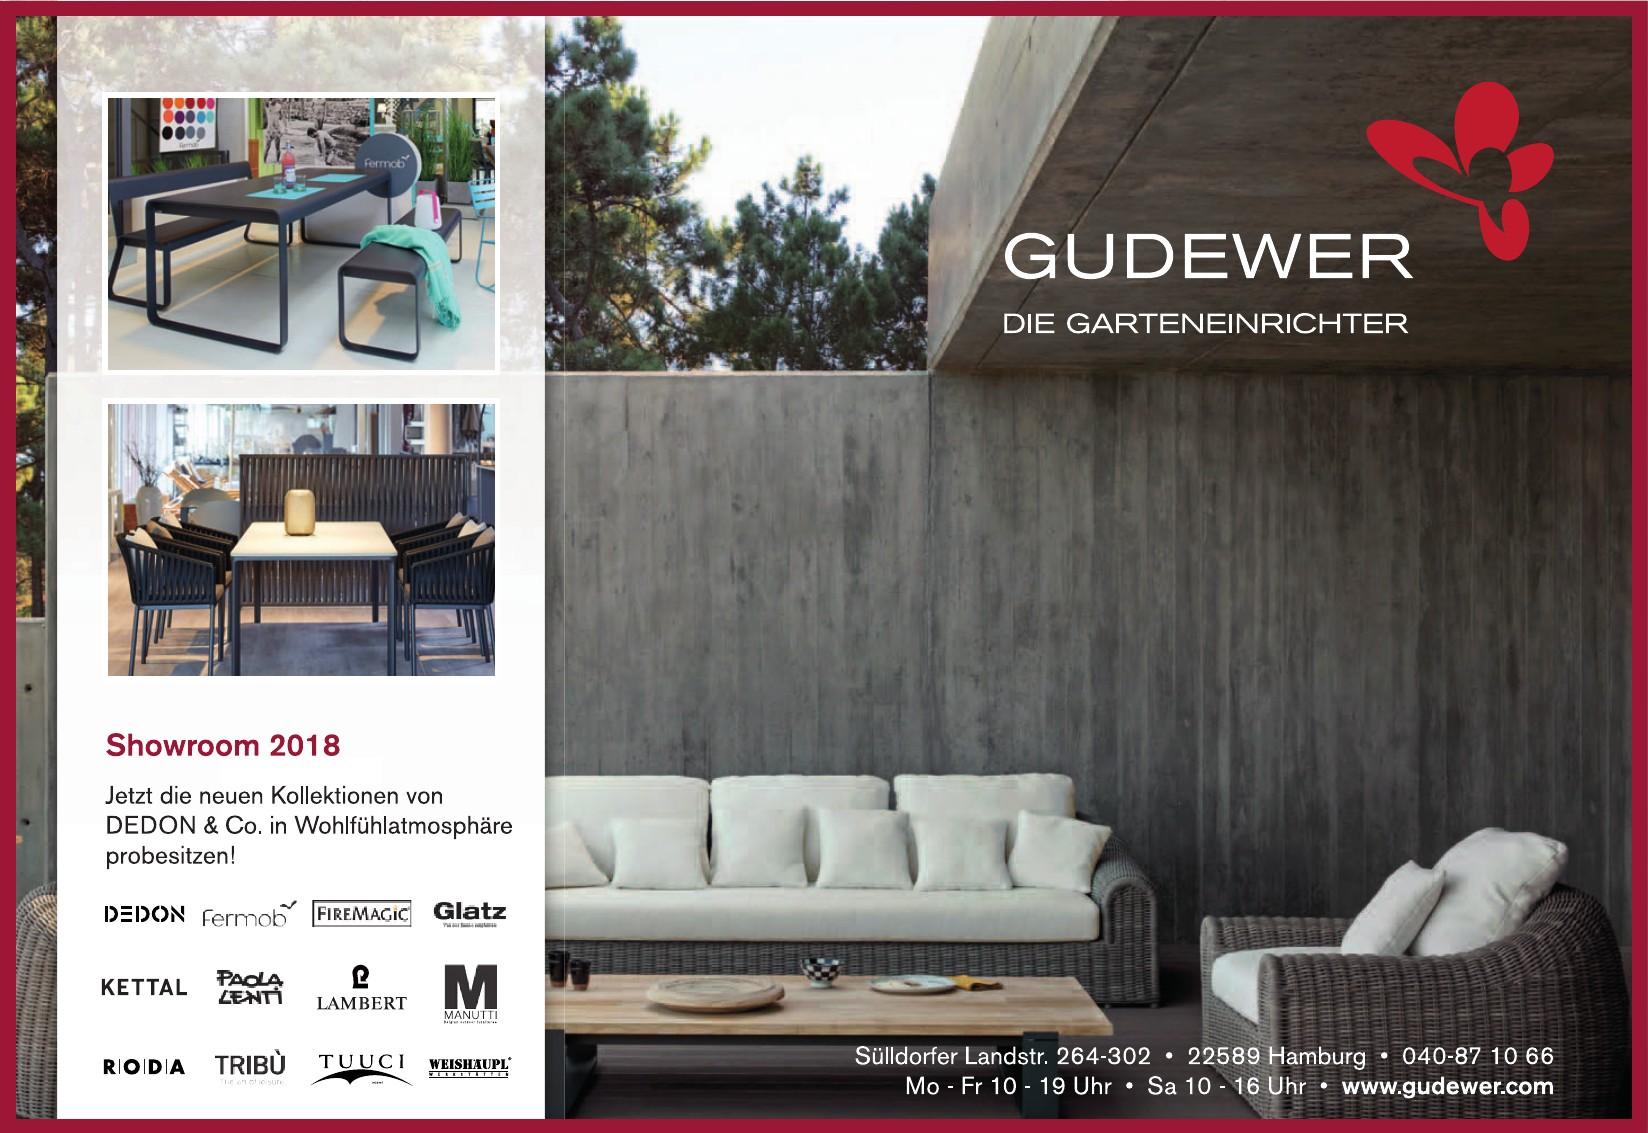 John Gudewer & Sohn GmbH & Co KG